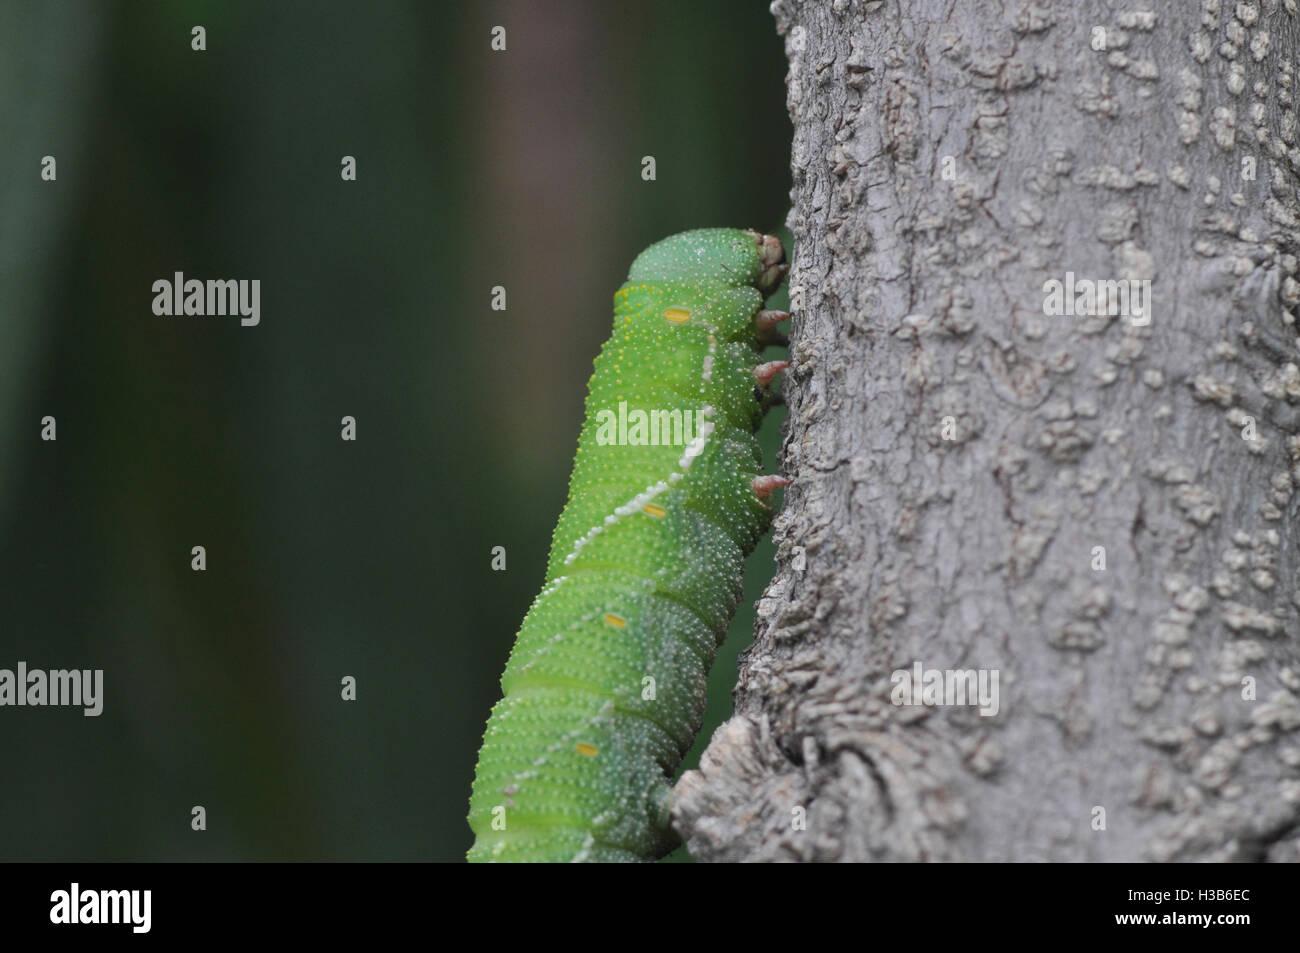 Noida, Uttar Pradesh, India- July 27, 2016: A big green caterpillar on a tree branch at Noida, Uttar Pradesh, India. - Stock Image